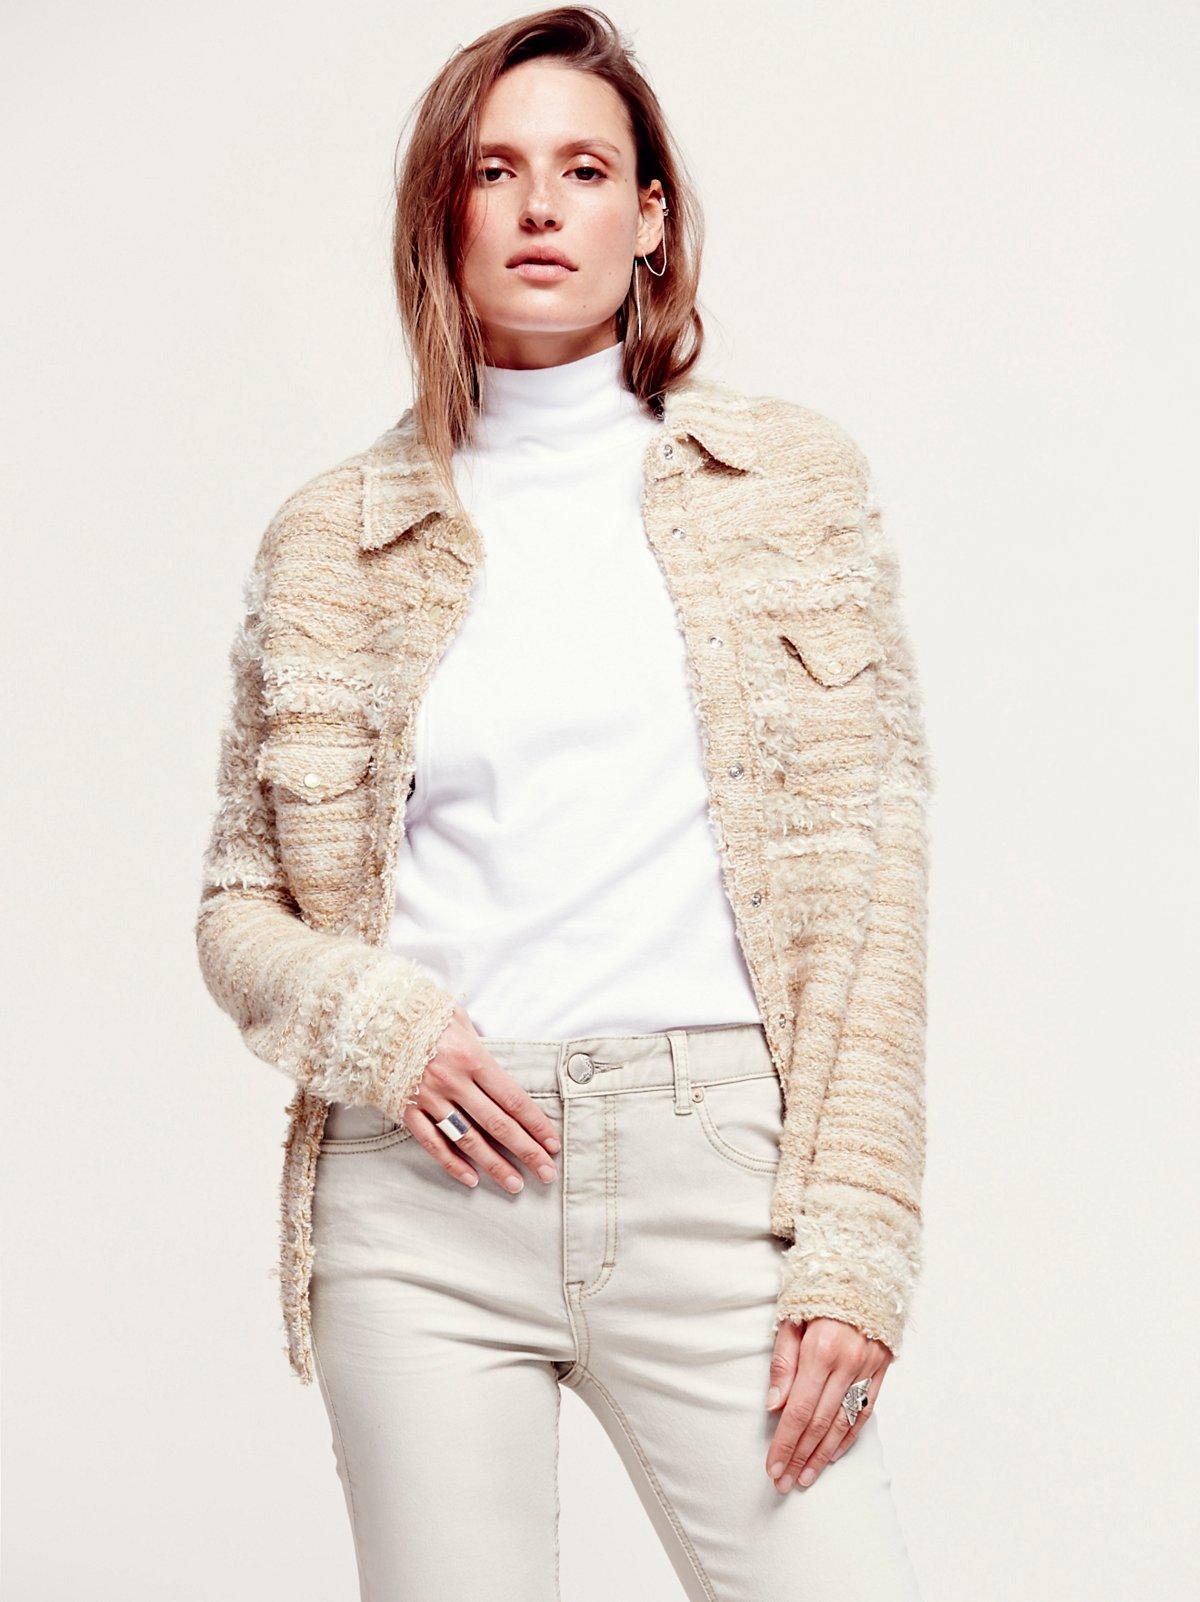 Heirloom Wester Jacket